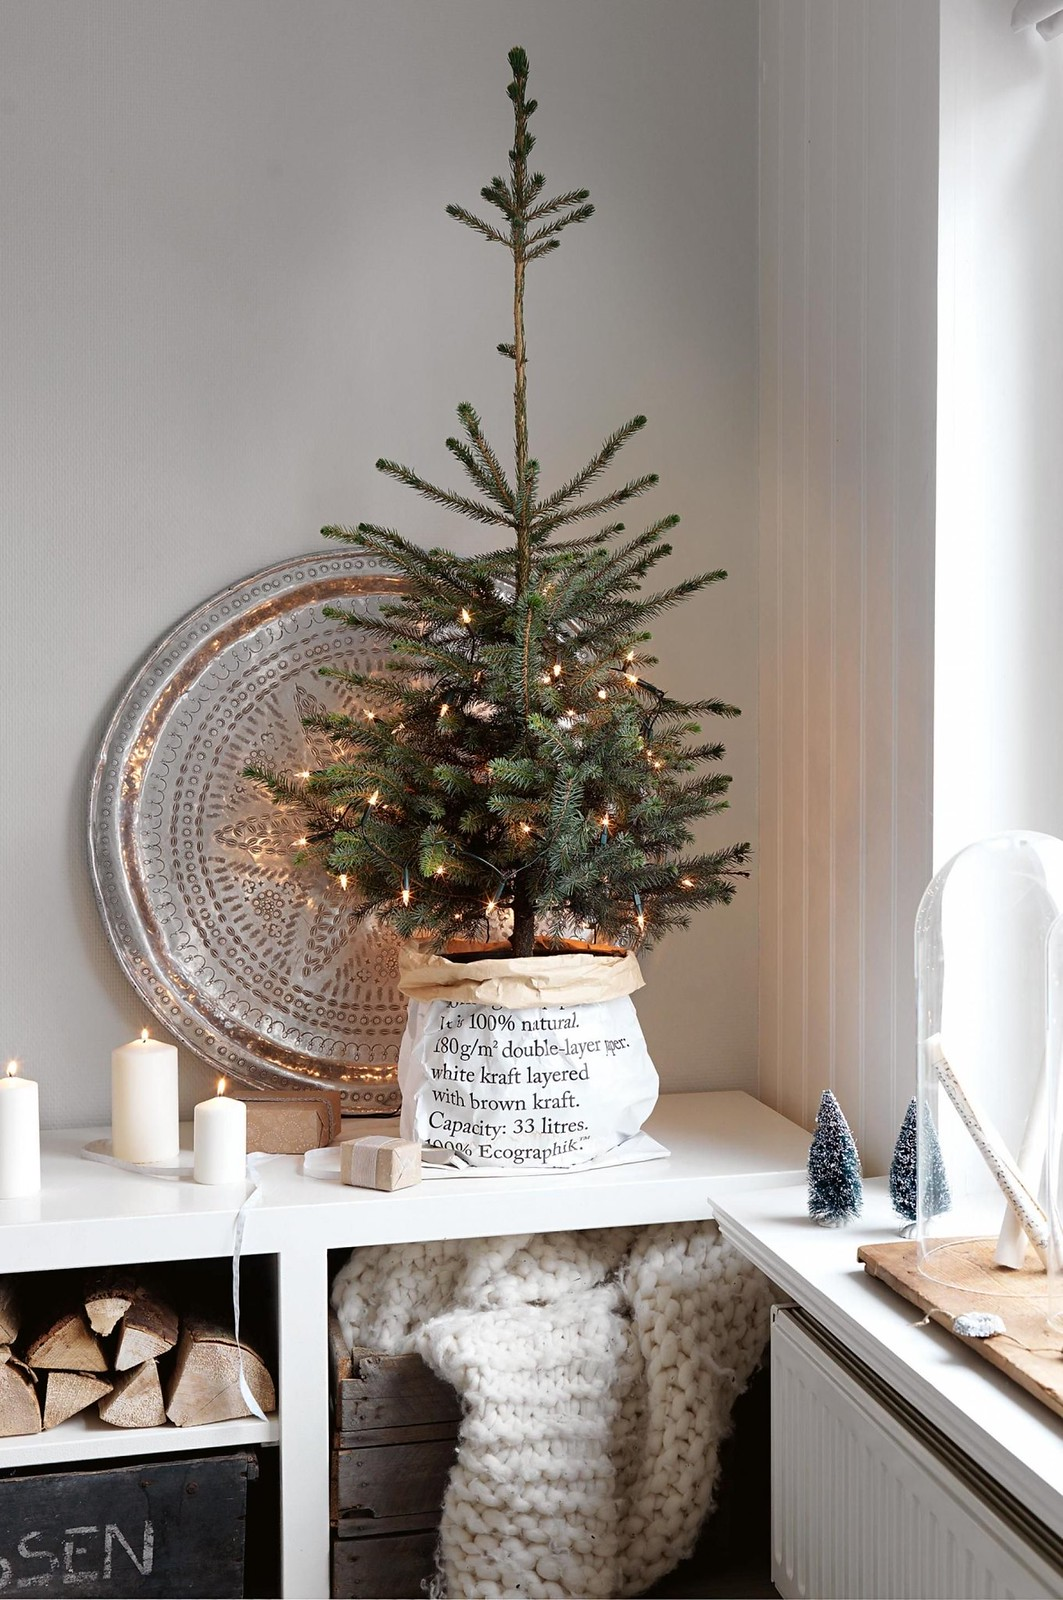 10 Ways to Decorate Your Christmas Tree - Mini Christmas Tree Just Lights